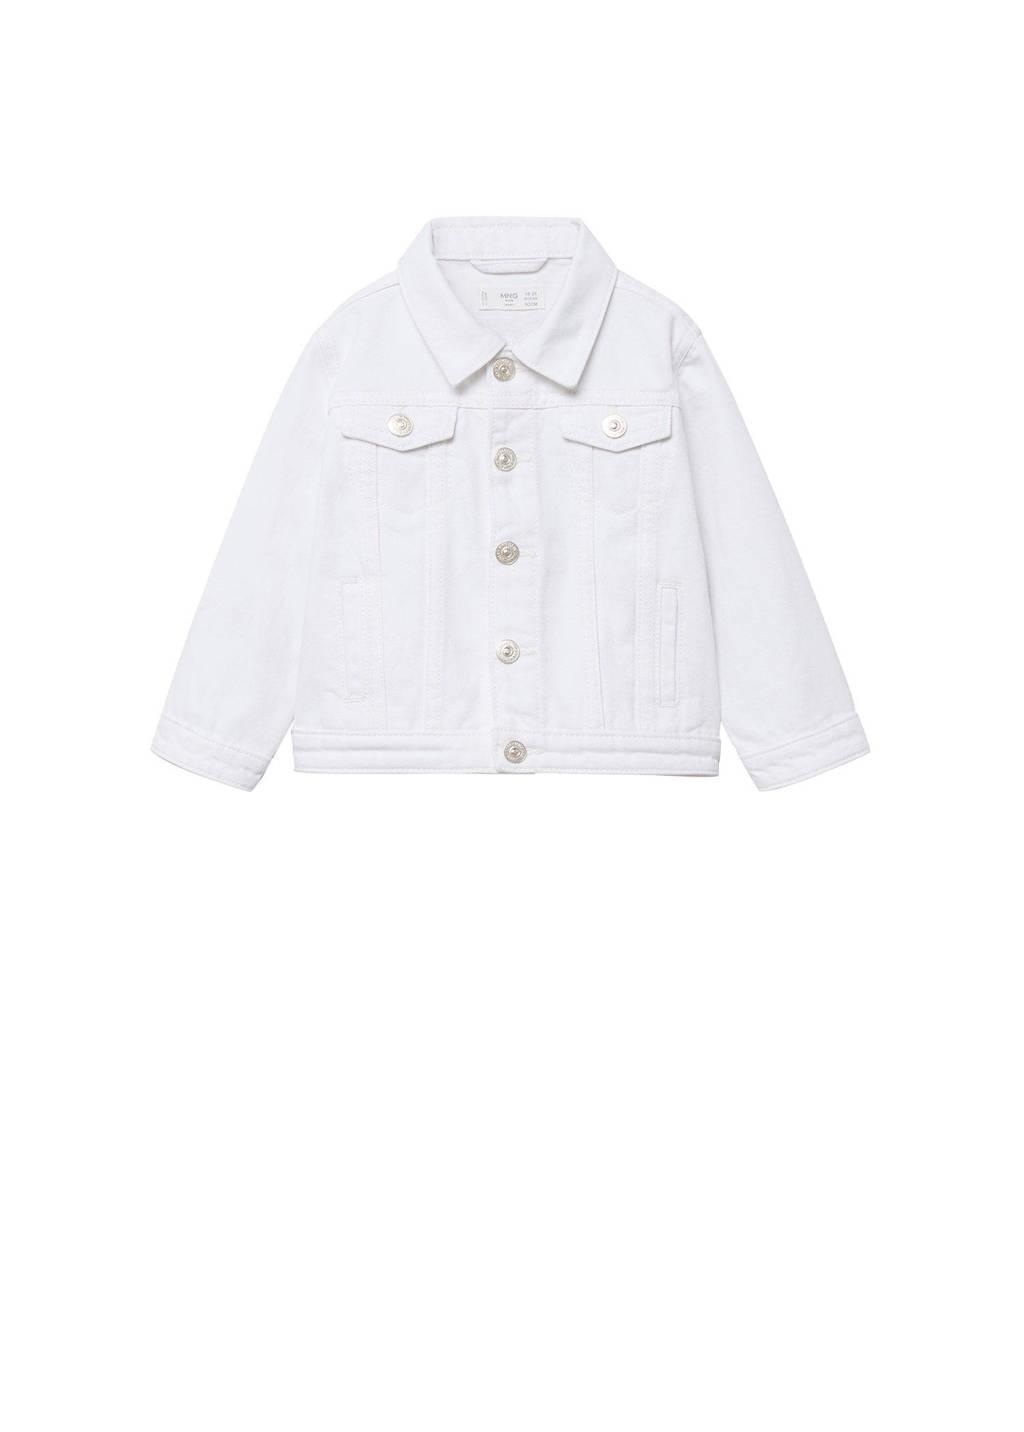 Mango Kids spijkerjas wit, Wit